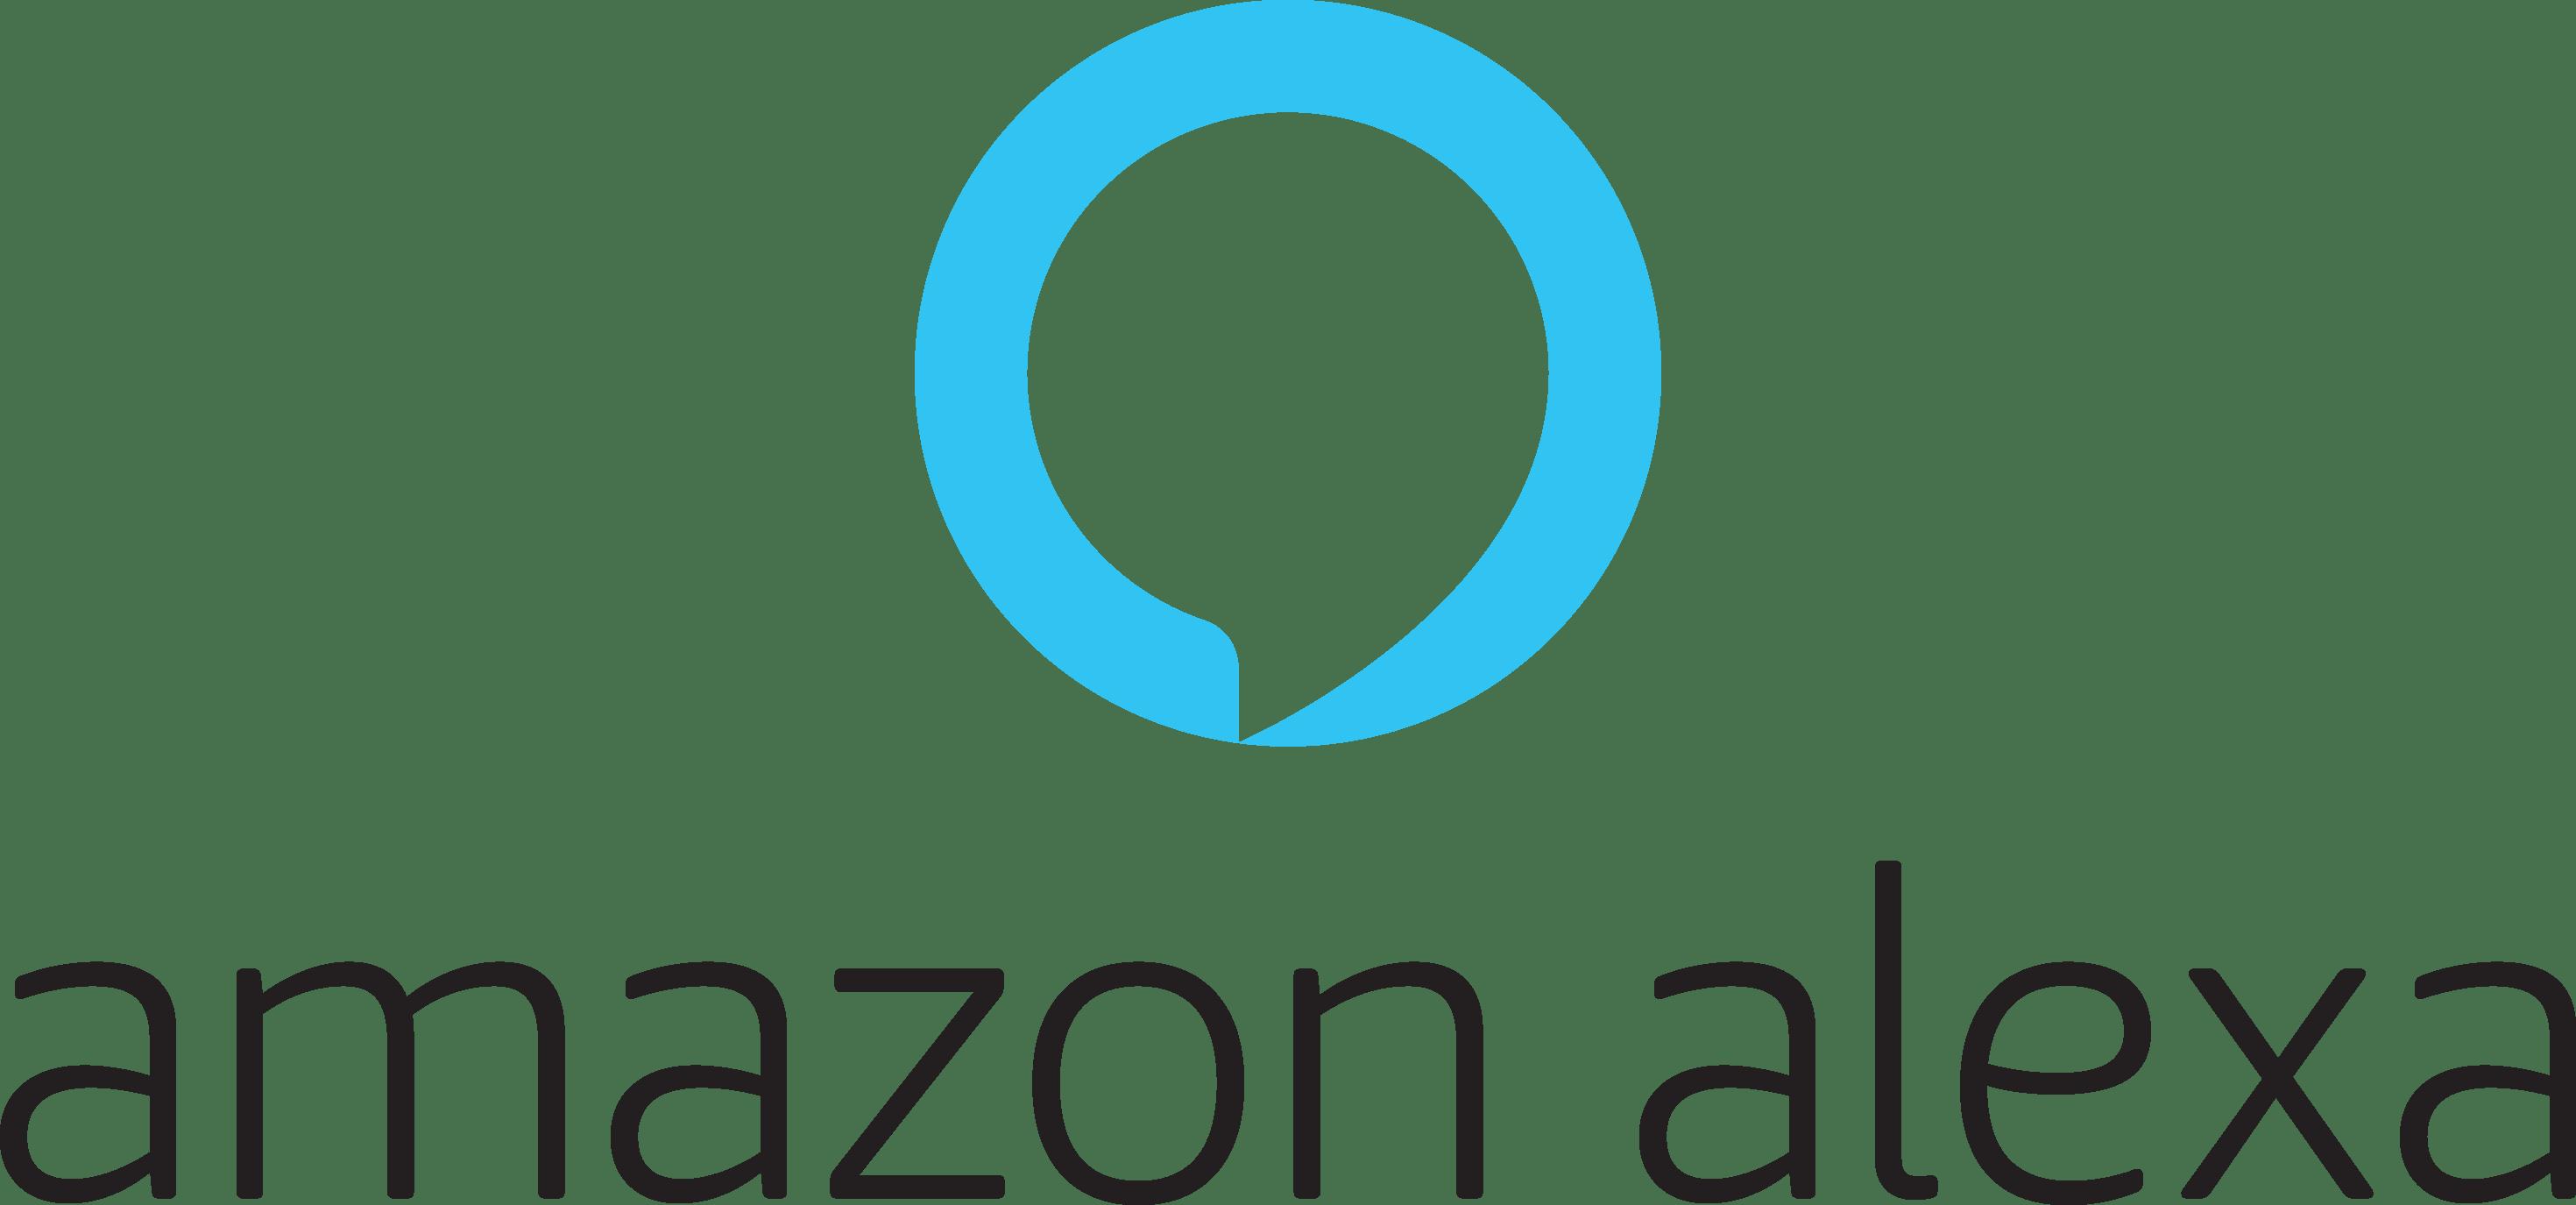 Amazon_Alexa_logo